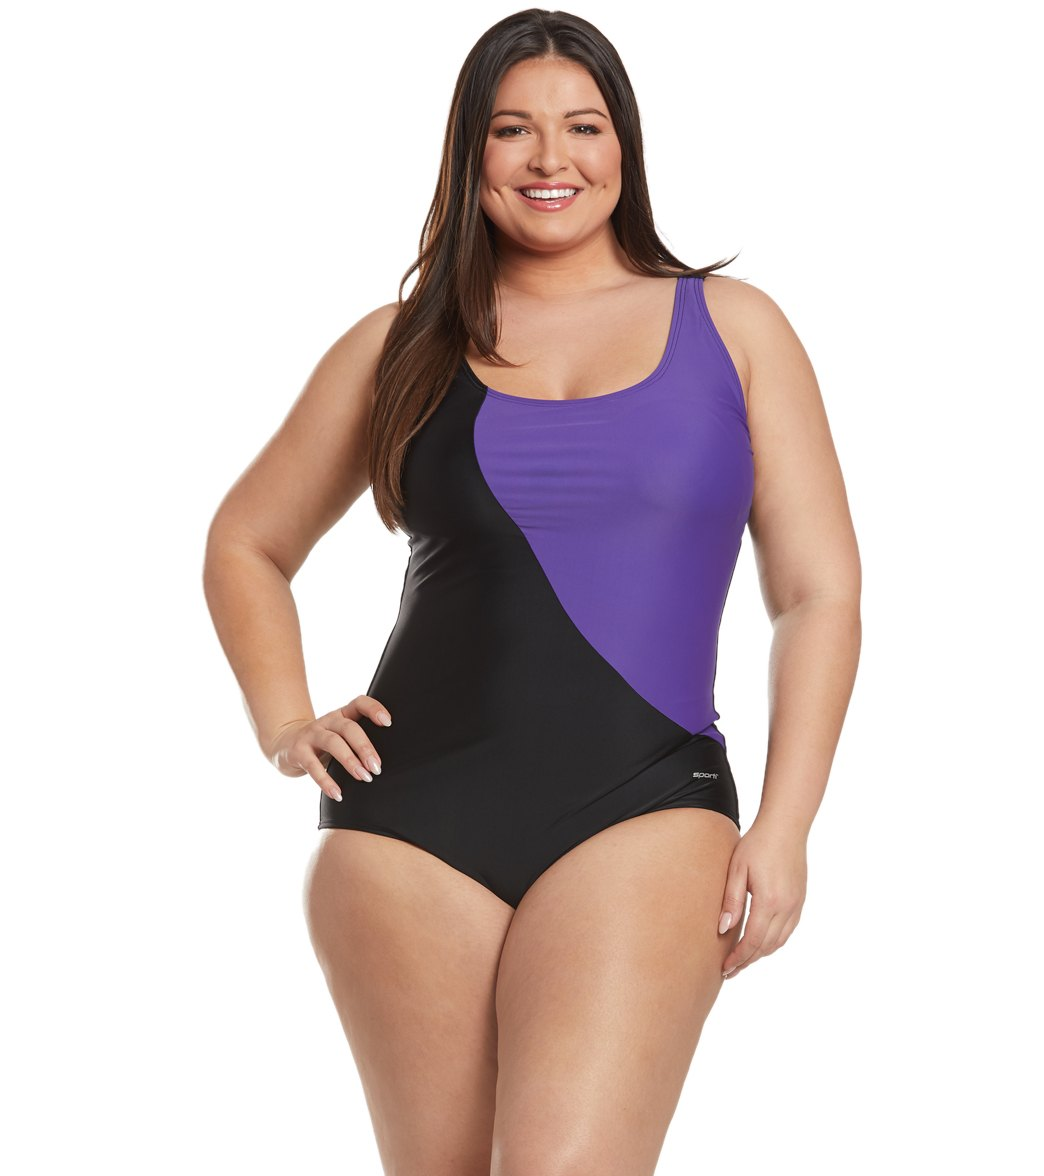 5612858f923f6 Sporti Plus Size Conservative Colorblock One Piece Swimsuit at  SwimOutlet.com